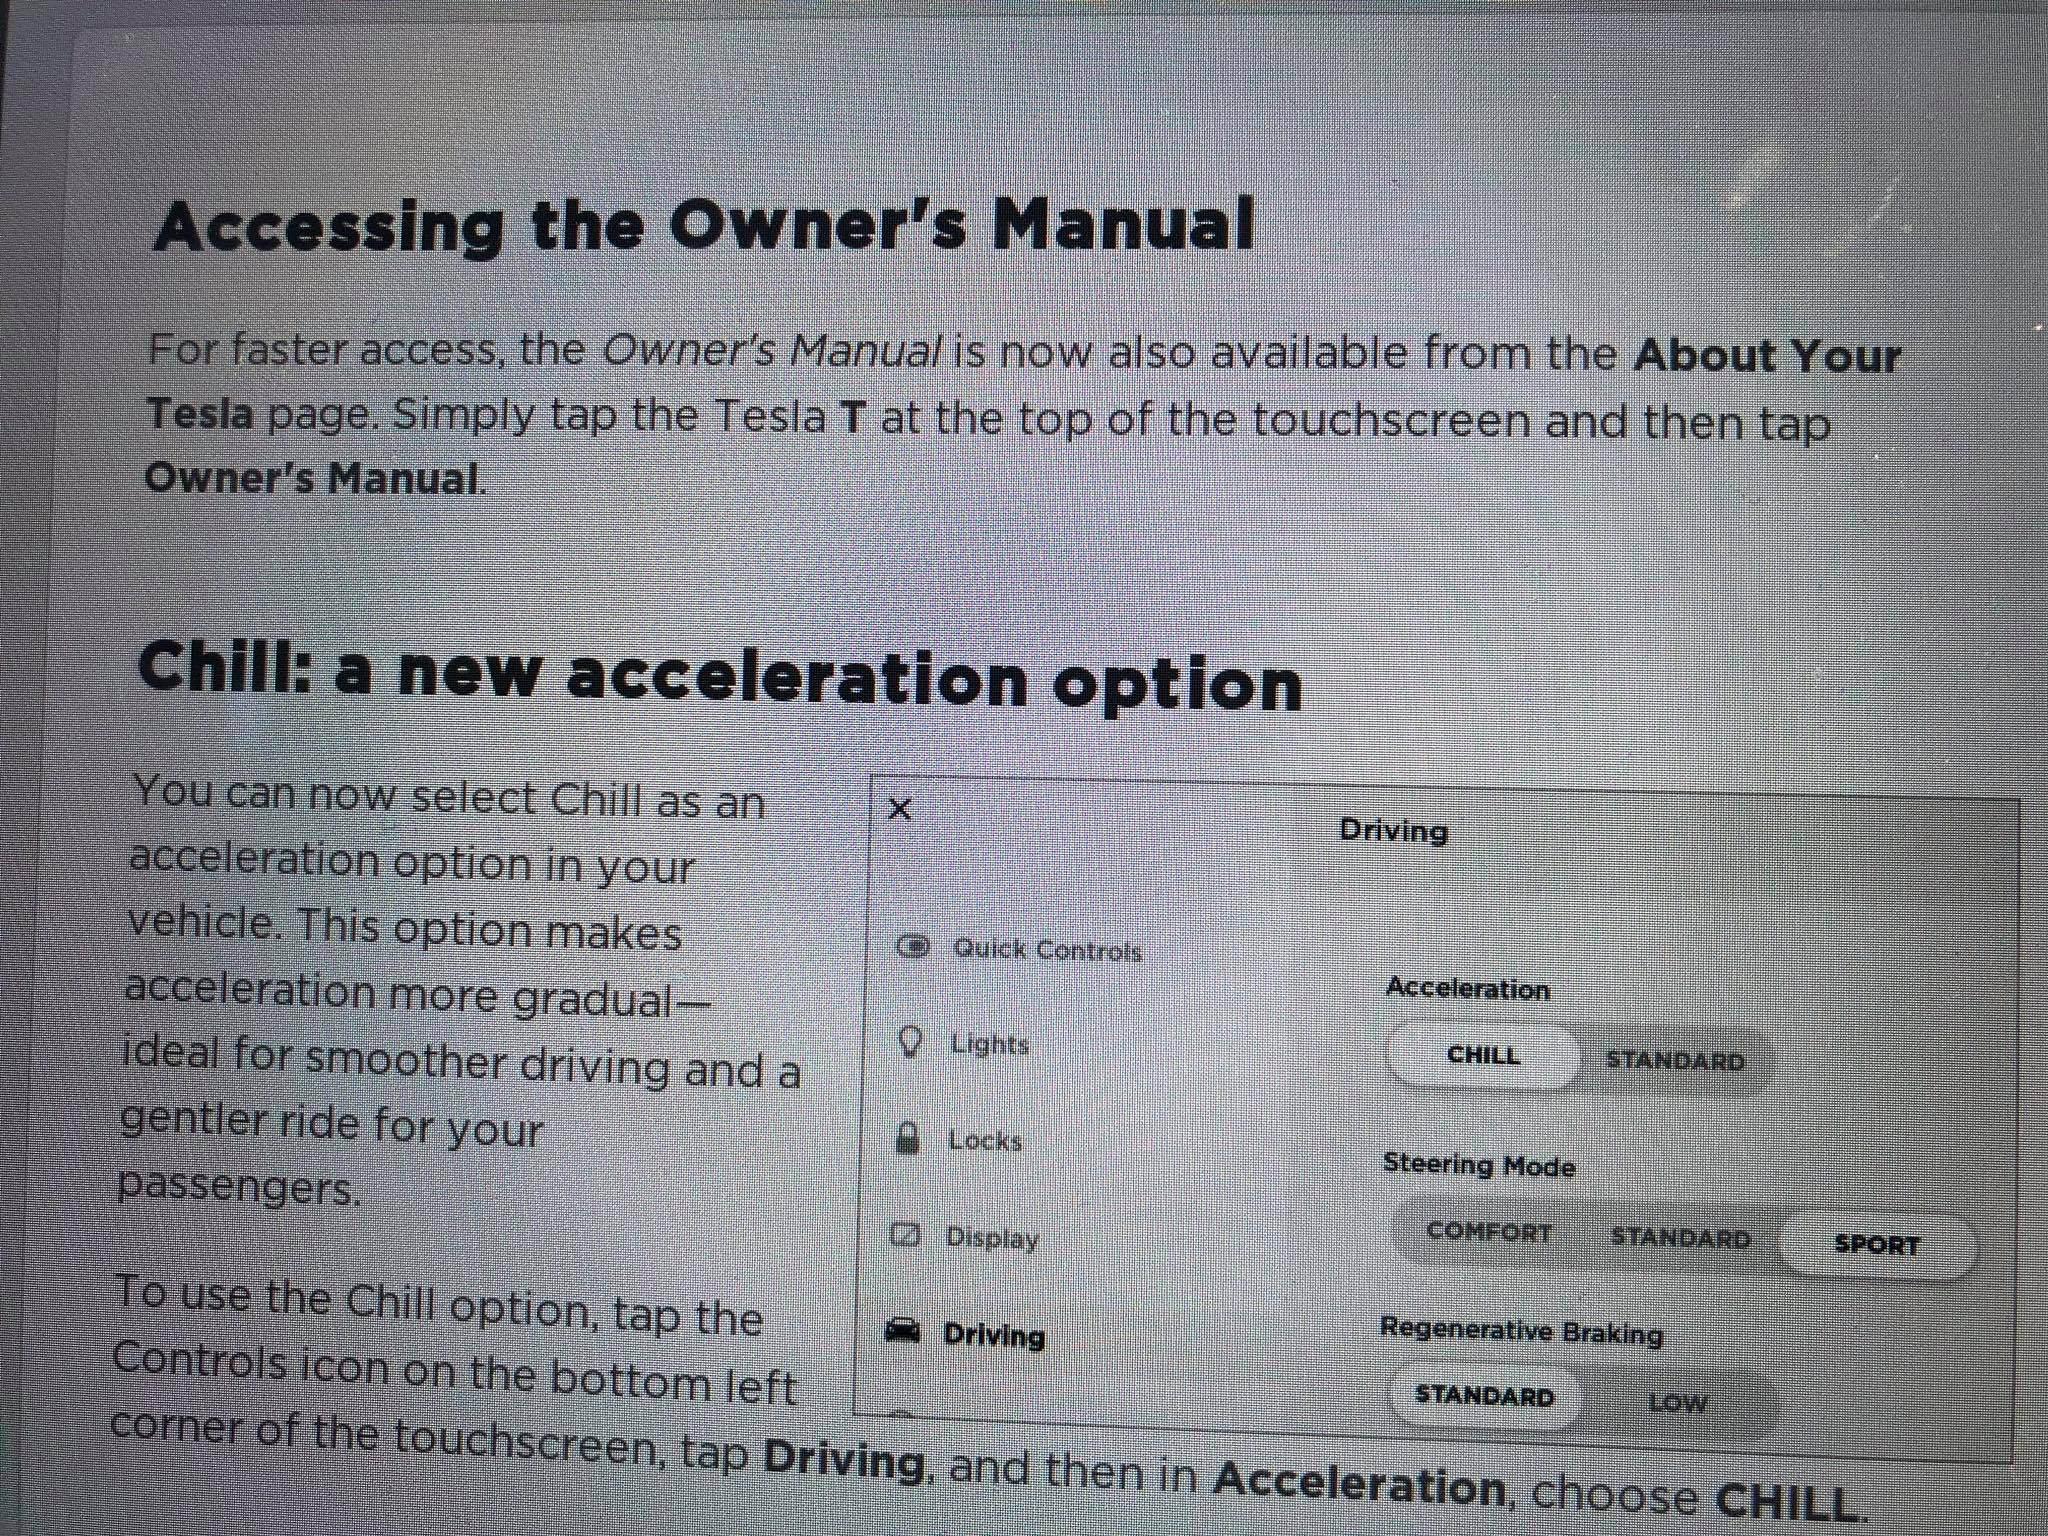 Model 3 chill mode [Credit: dirtyfries/Reddit]